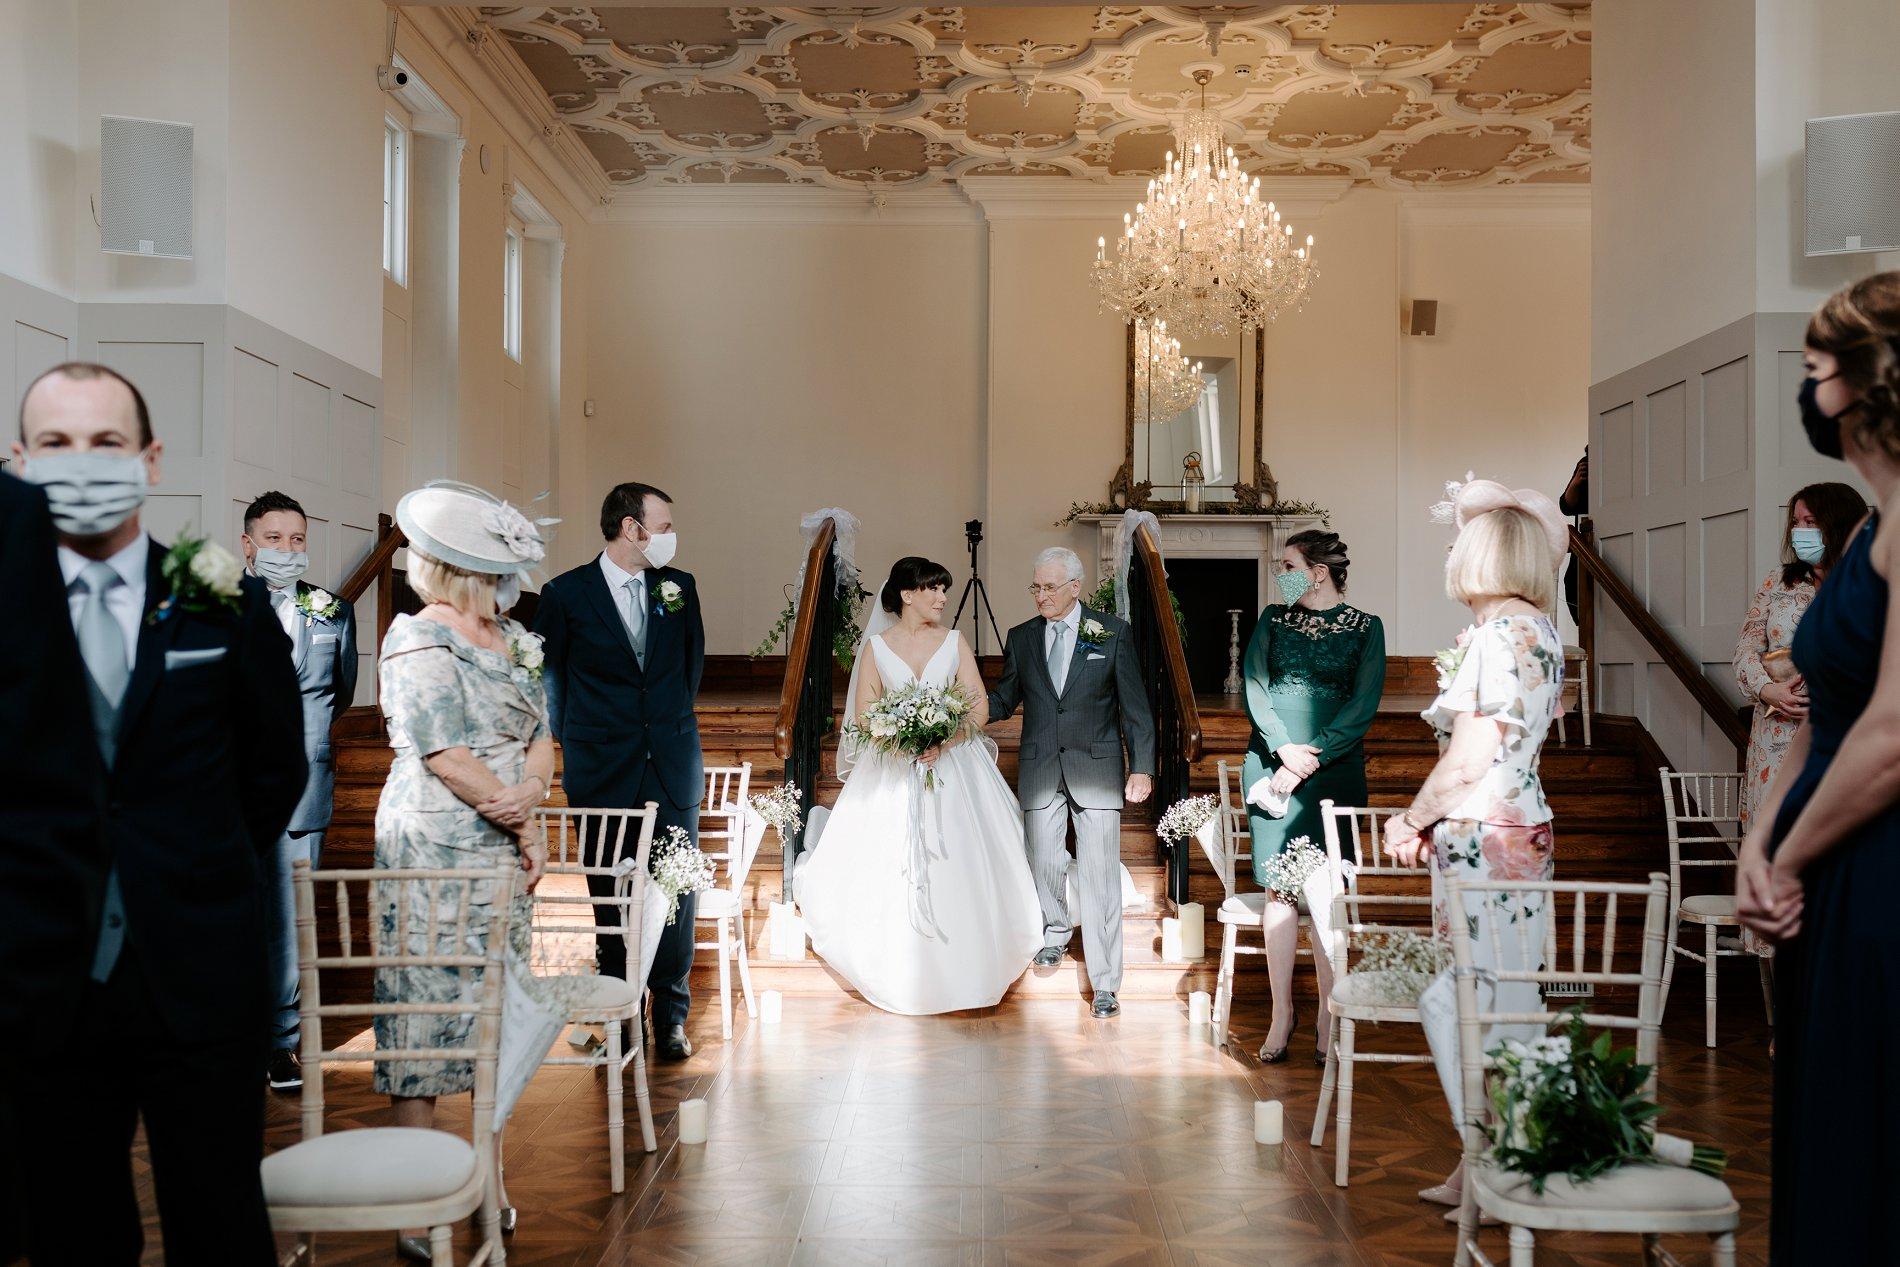 An Elegant White Wedding at Thicket Priory (c) Carla Whittingham Photography (33)